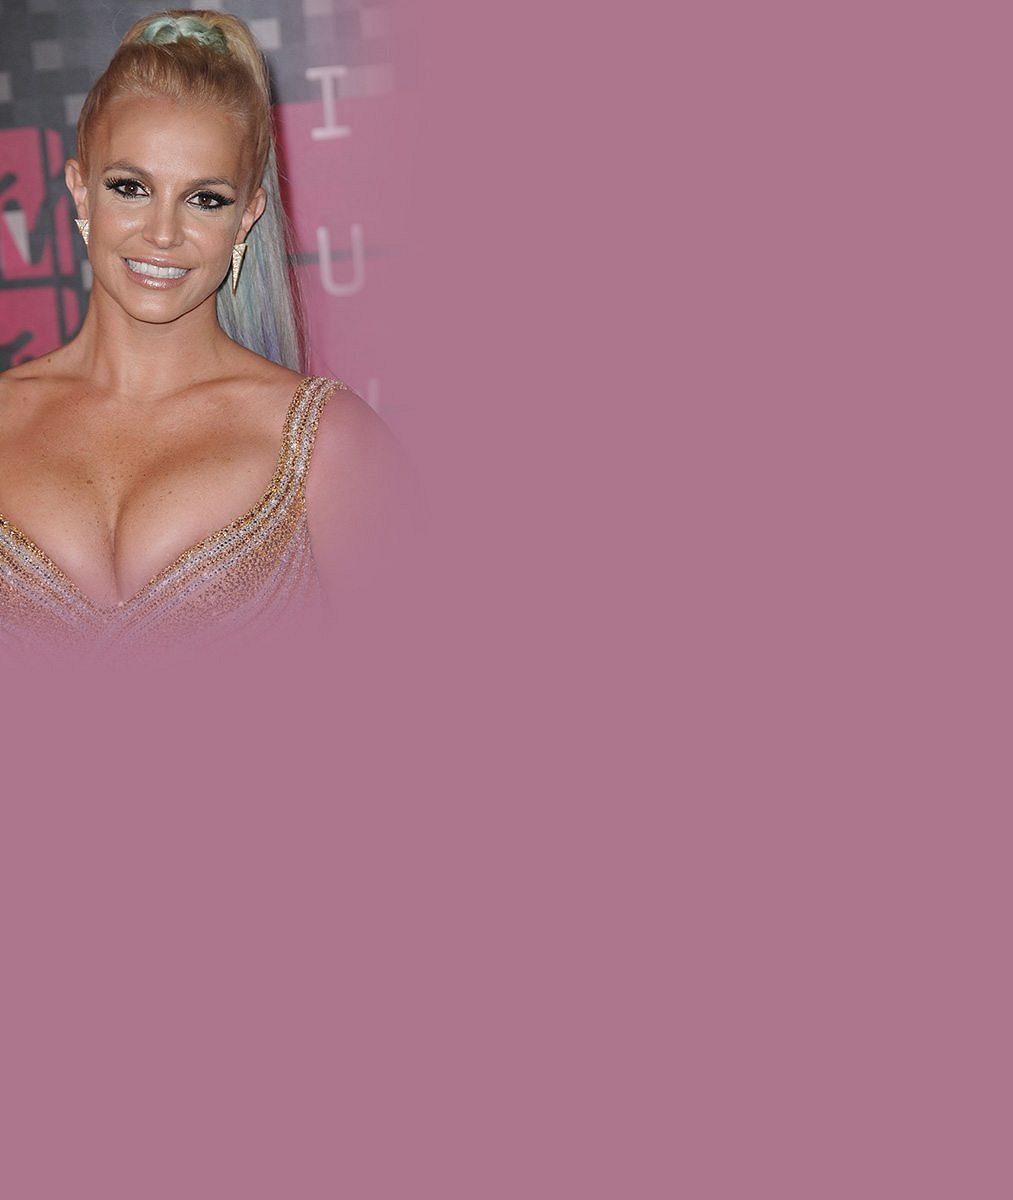 Mamina Britney Spears? Ani náhodou. S postavičkou jako v osmnácti natočila žhavé video